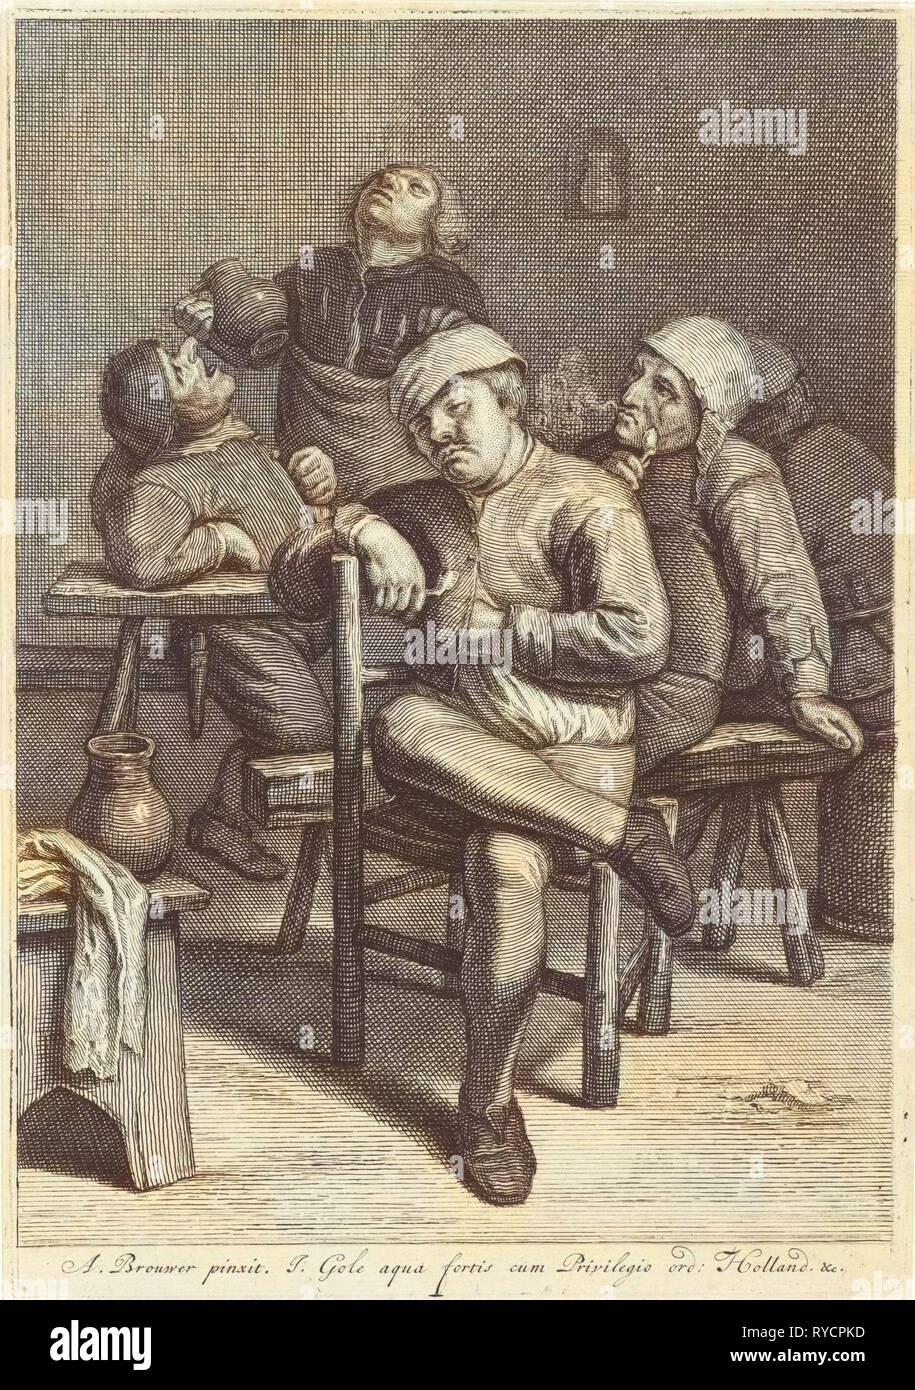 Tavern Scene with smoking farmers, Jacob Gole, Republiek der Zeven Verenigde Nederlanden, 1670 - 1724 - Stock Image